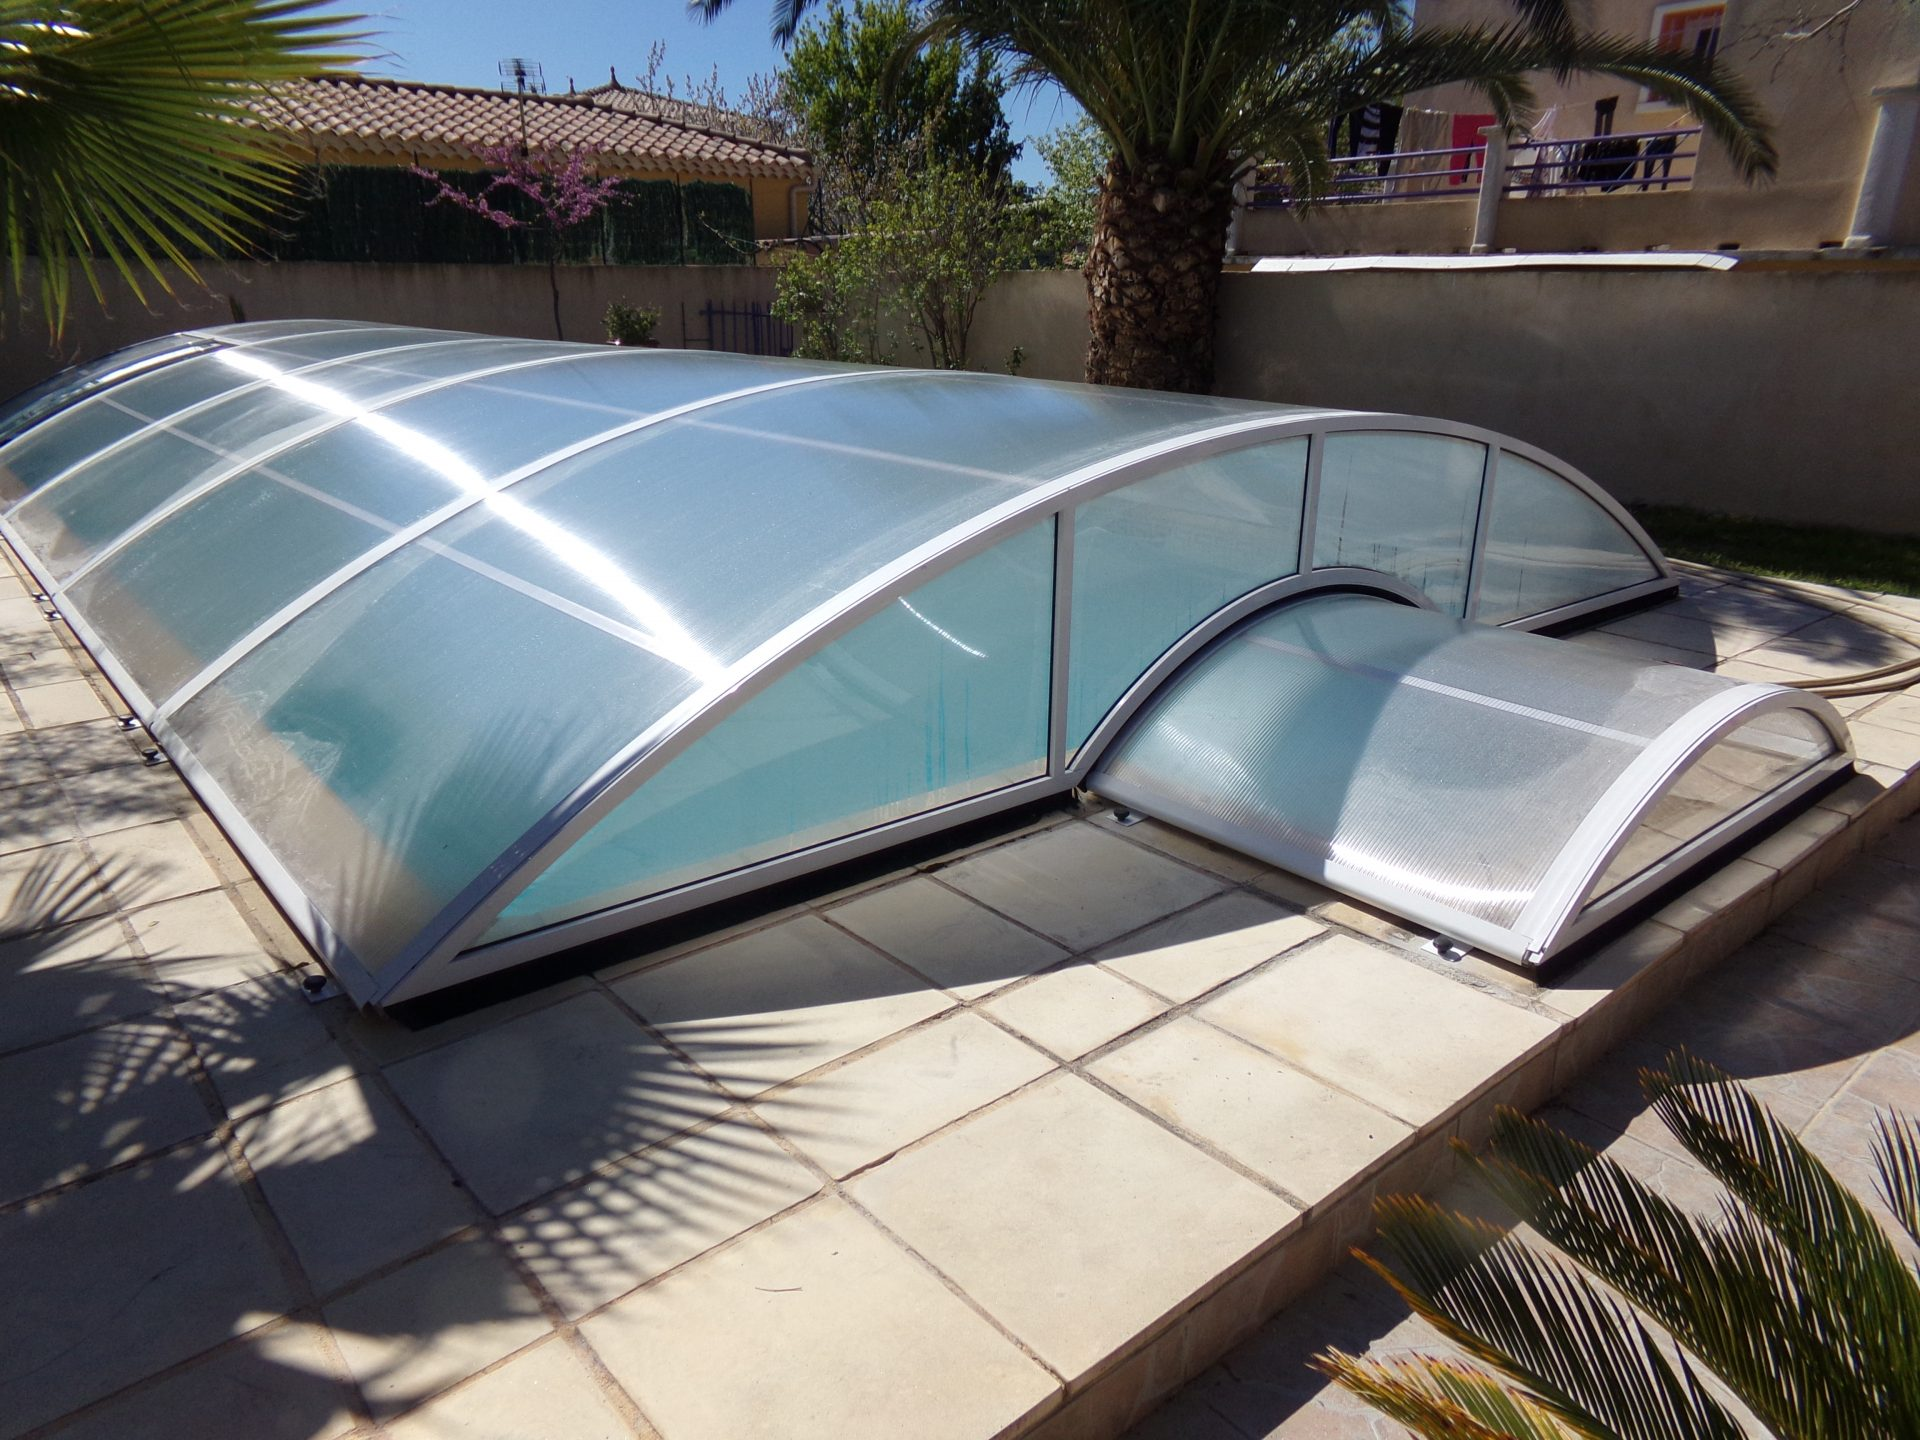 abri piscine bas relevable et amovible mod le berlin. Black Bedroom Furniture Sets. Home Design Ideas